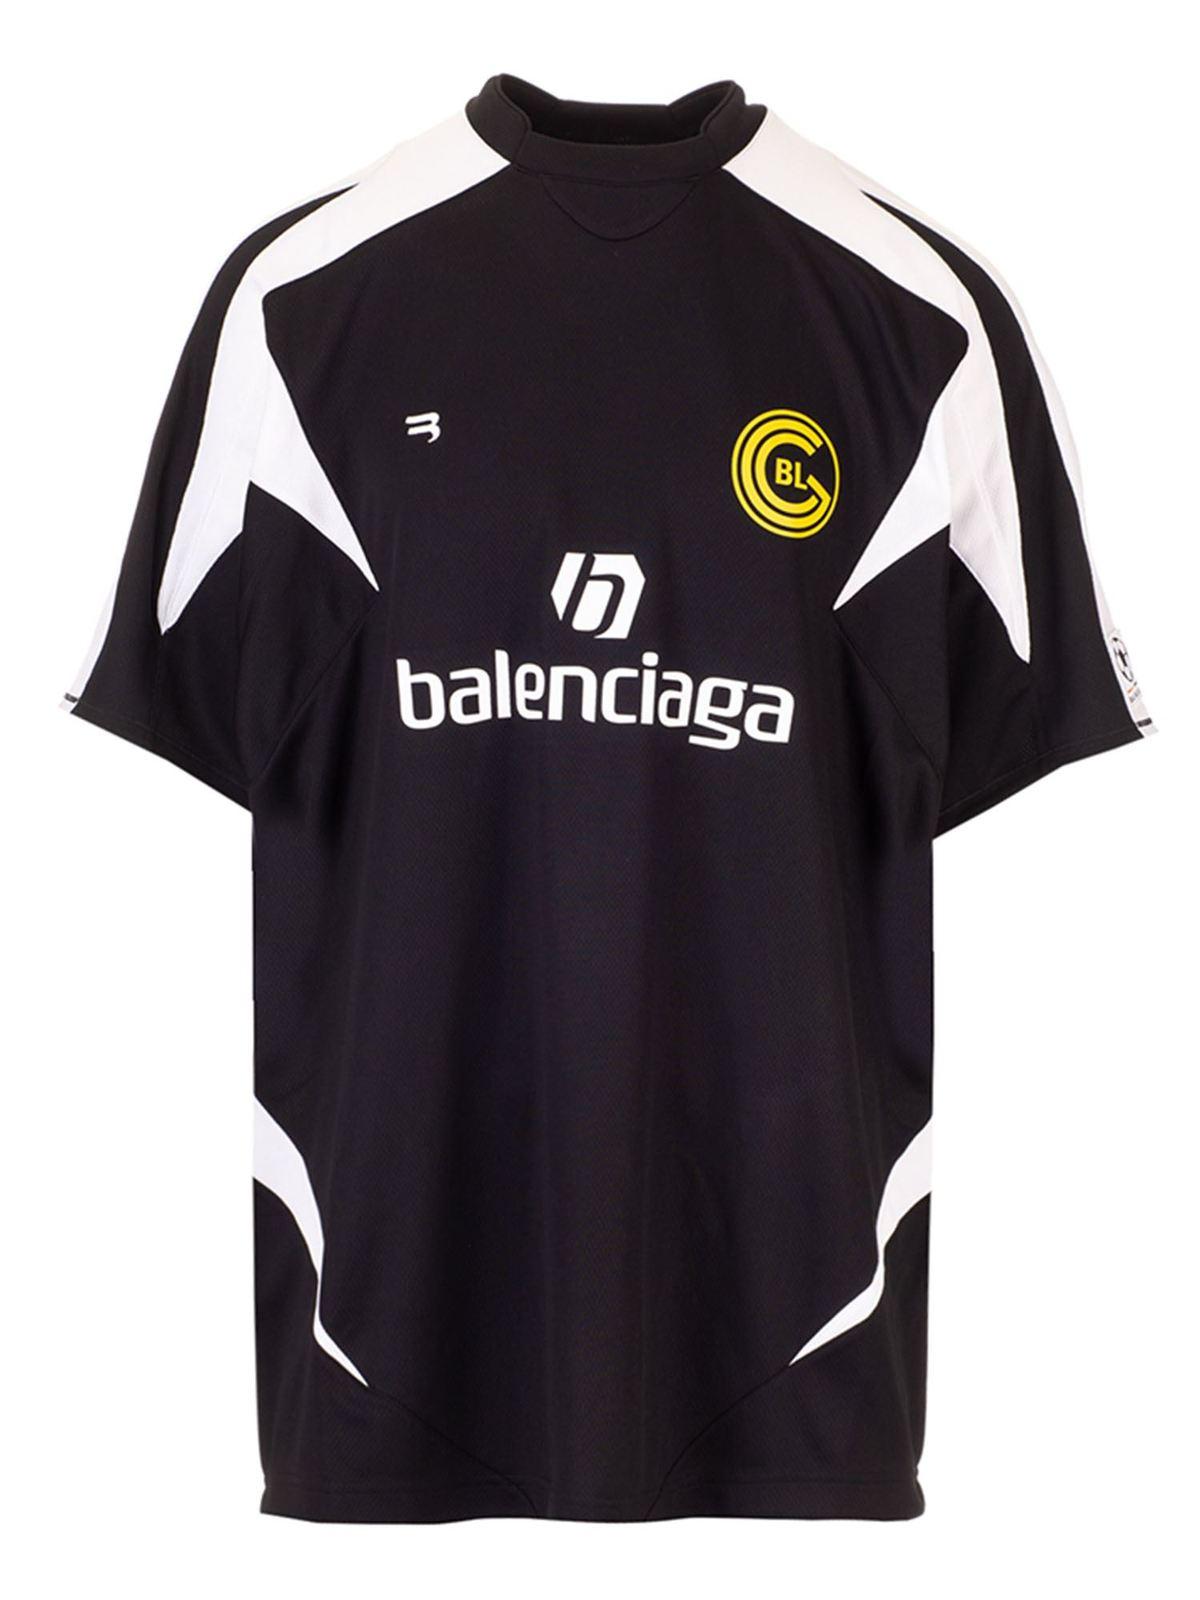 BALENCIAGA SOCCER T-SHIRT IN BLACK